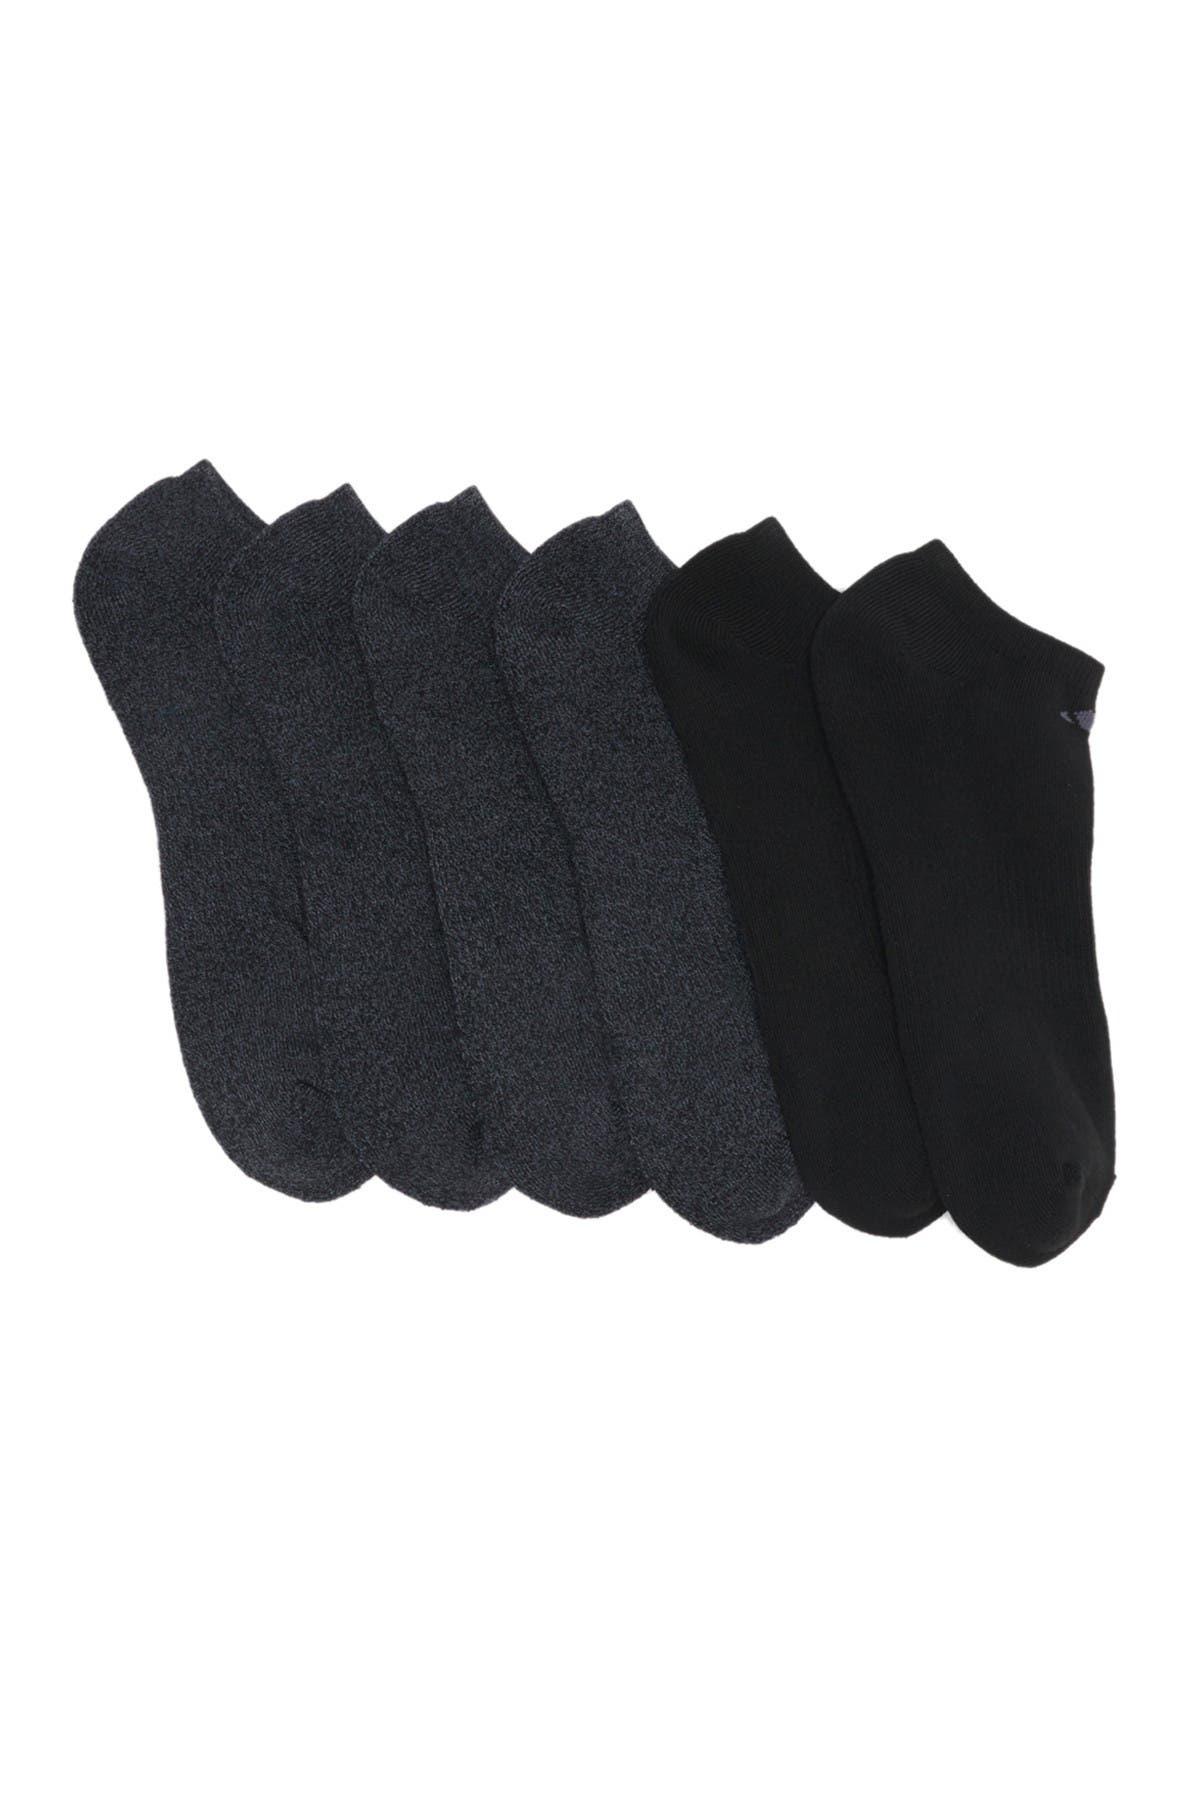 Image of adidas Superlite No Show Socks - Pack of 6